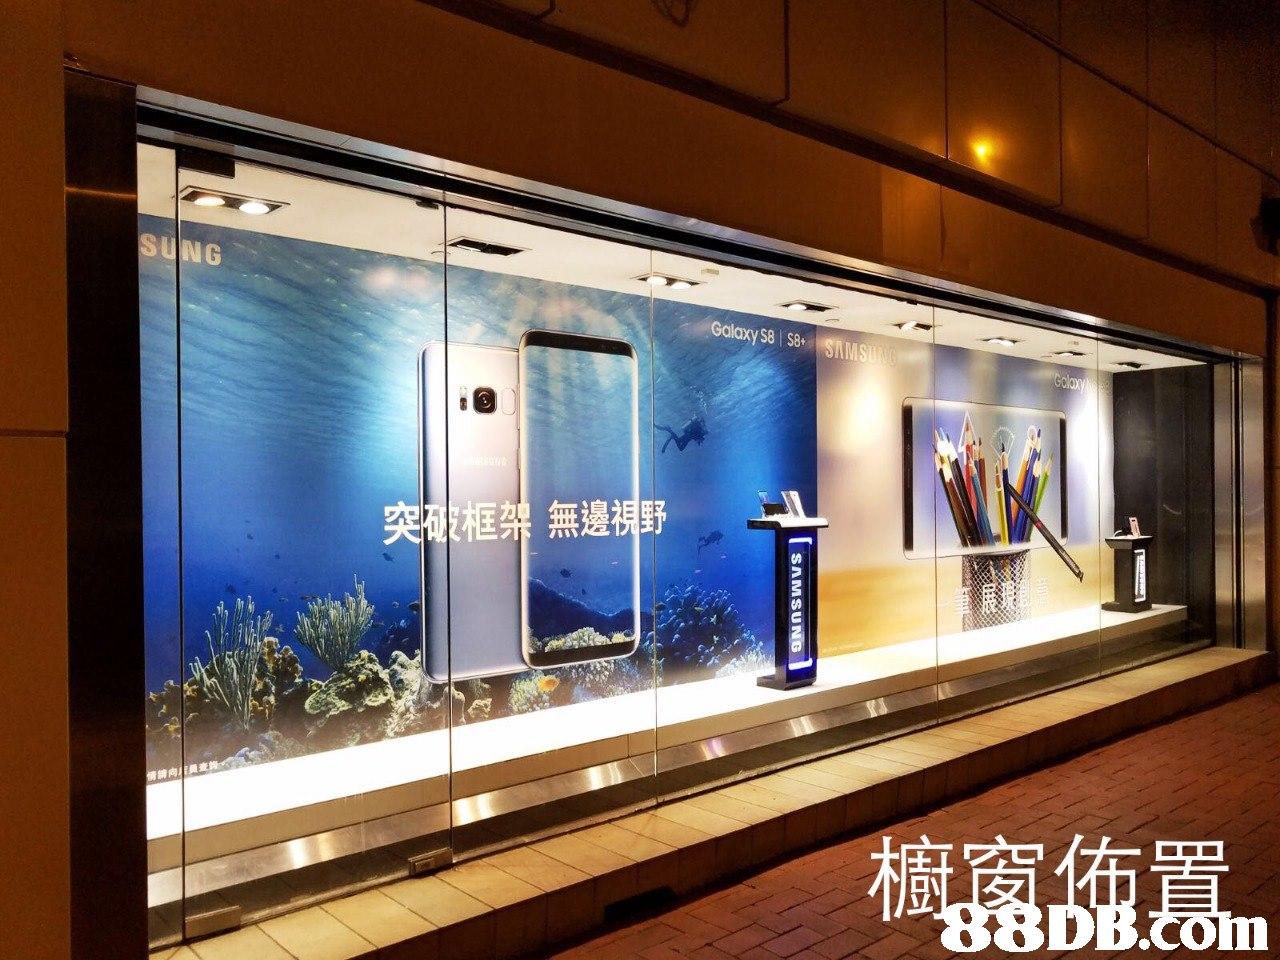 Galaxy S8 S8 框架無邊視野 突  Ceiling,Wall,Building,Aquarium,Glass